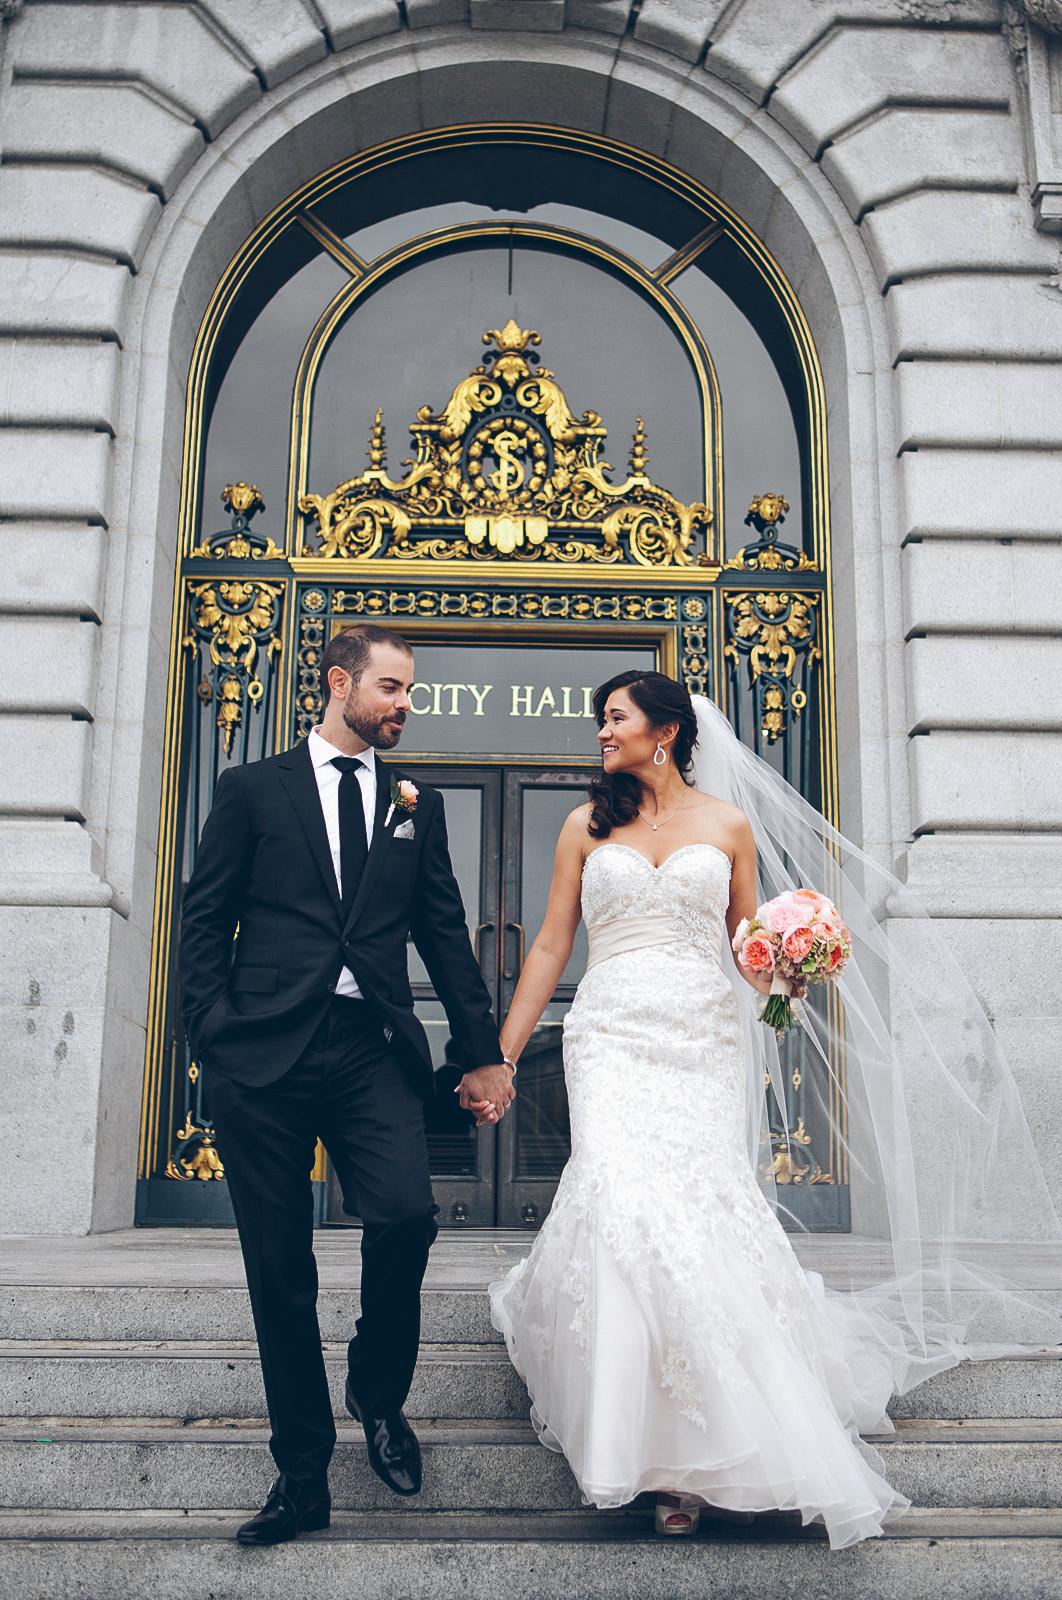 San_francisco_city_hall_wedding_photography_meegan_travis_ebony_siovhan_bokeh_photography_57.jpg